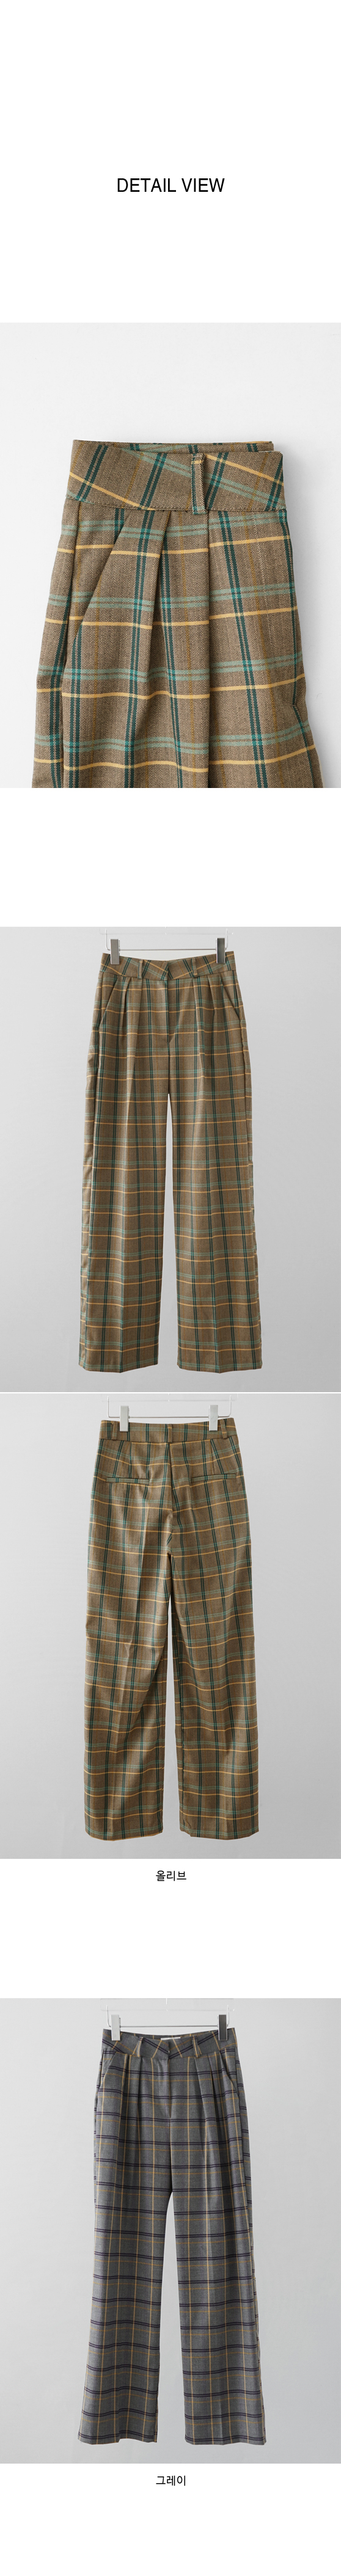 vintage check pintuck slacks